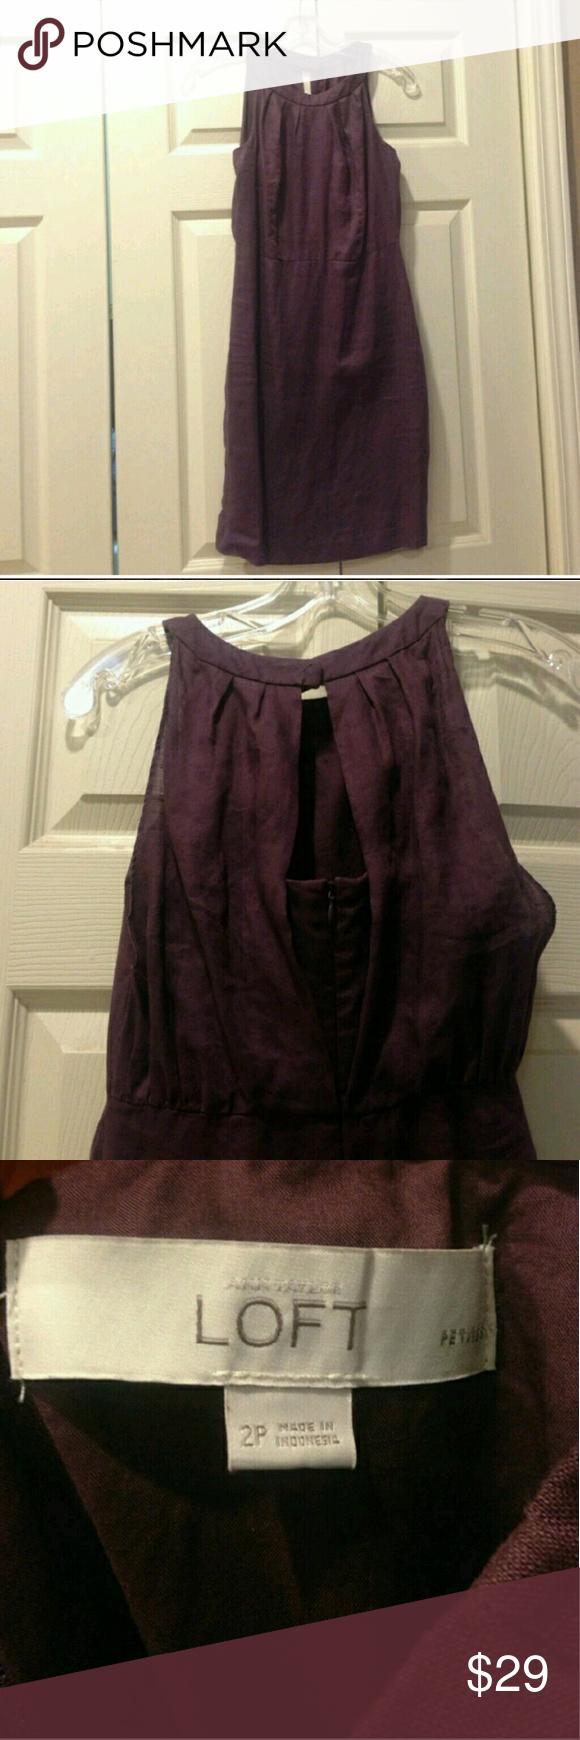 Ann Taylor Loft Dress 100% linen & lining 100% Cotton. Ann Taylor Dresses Midi